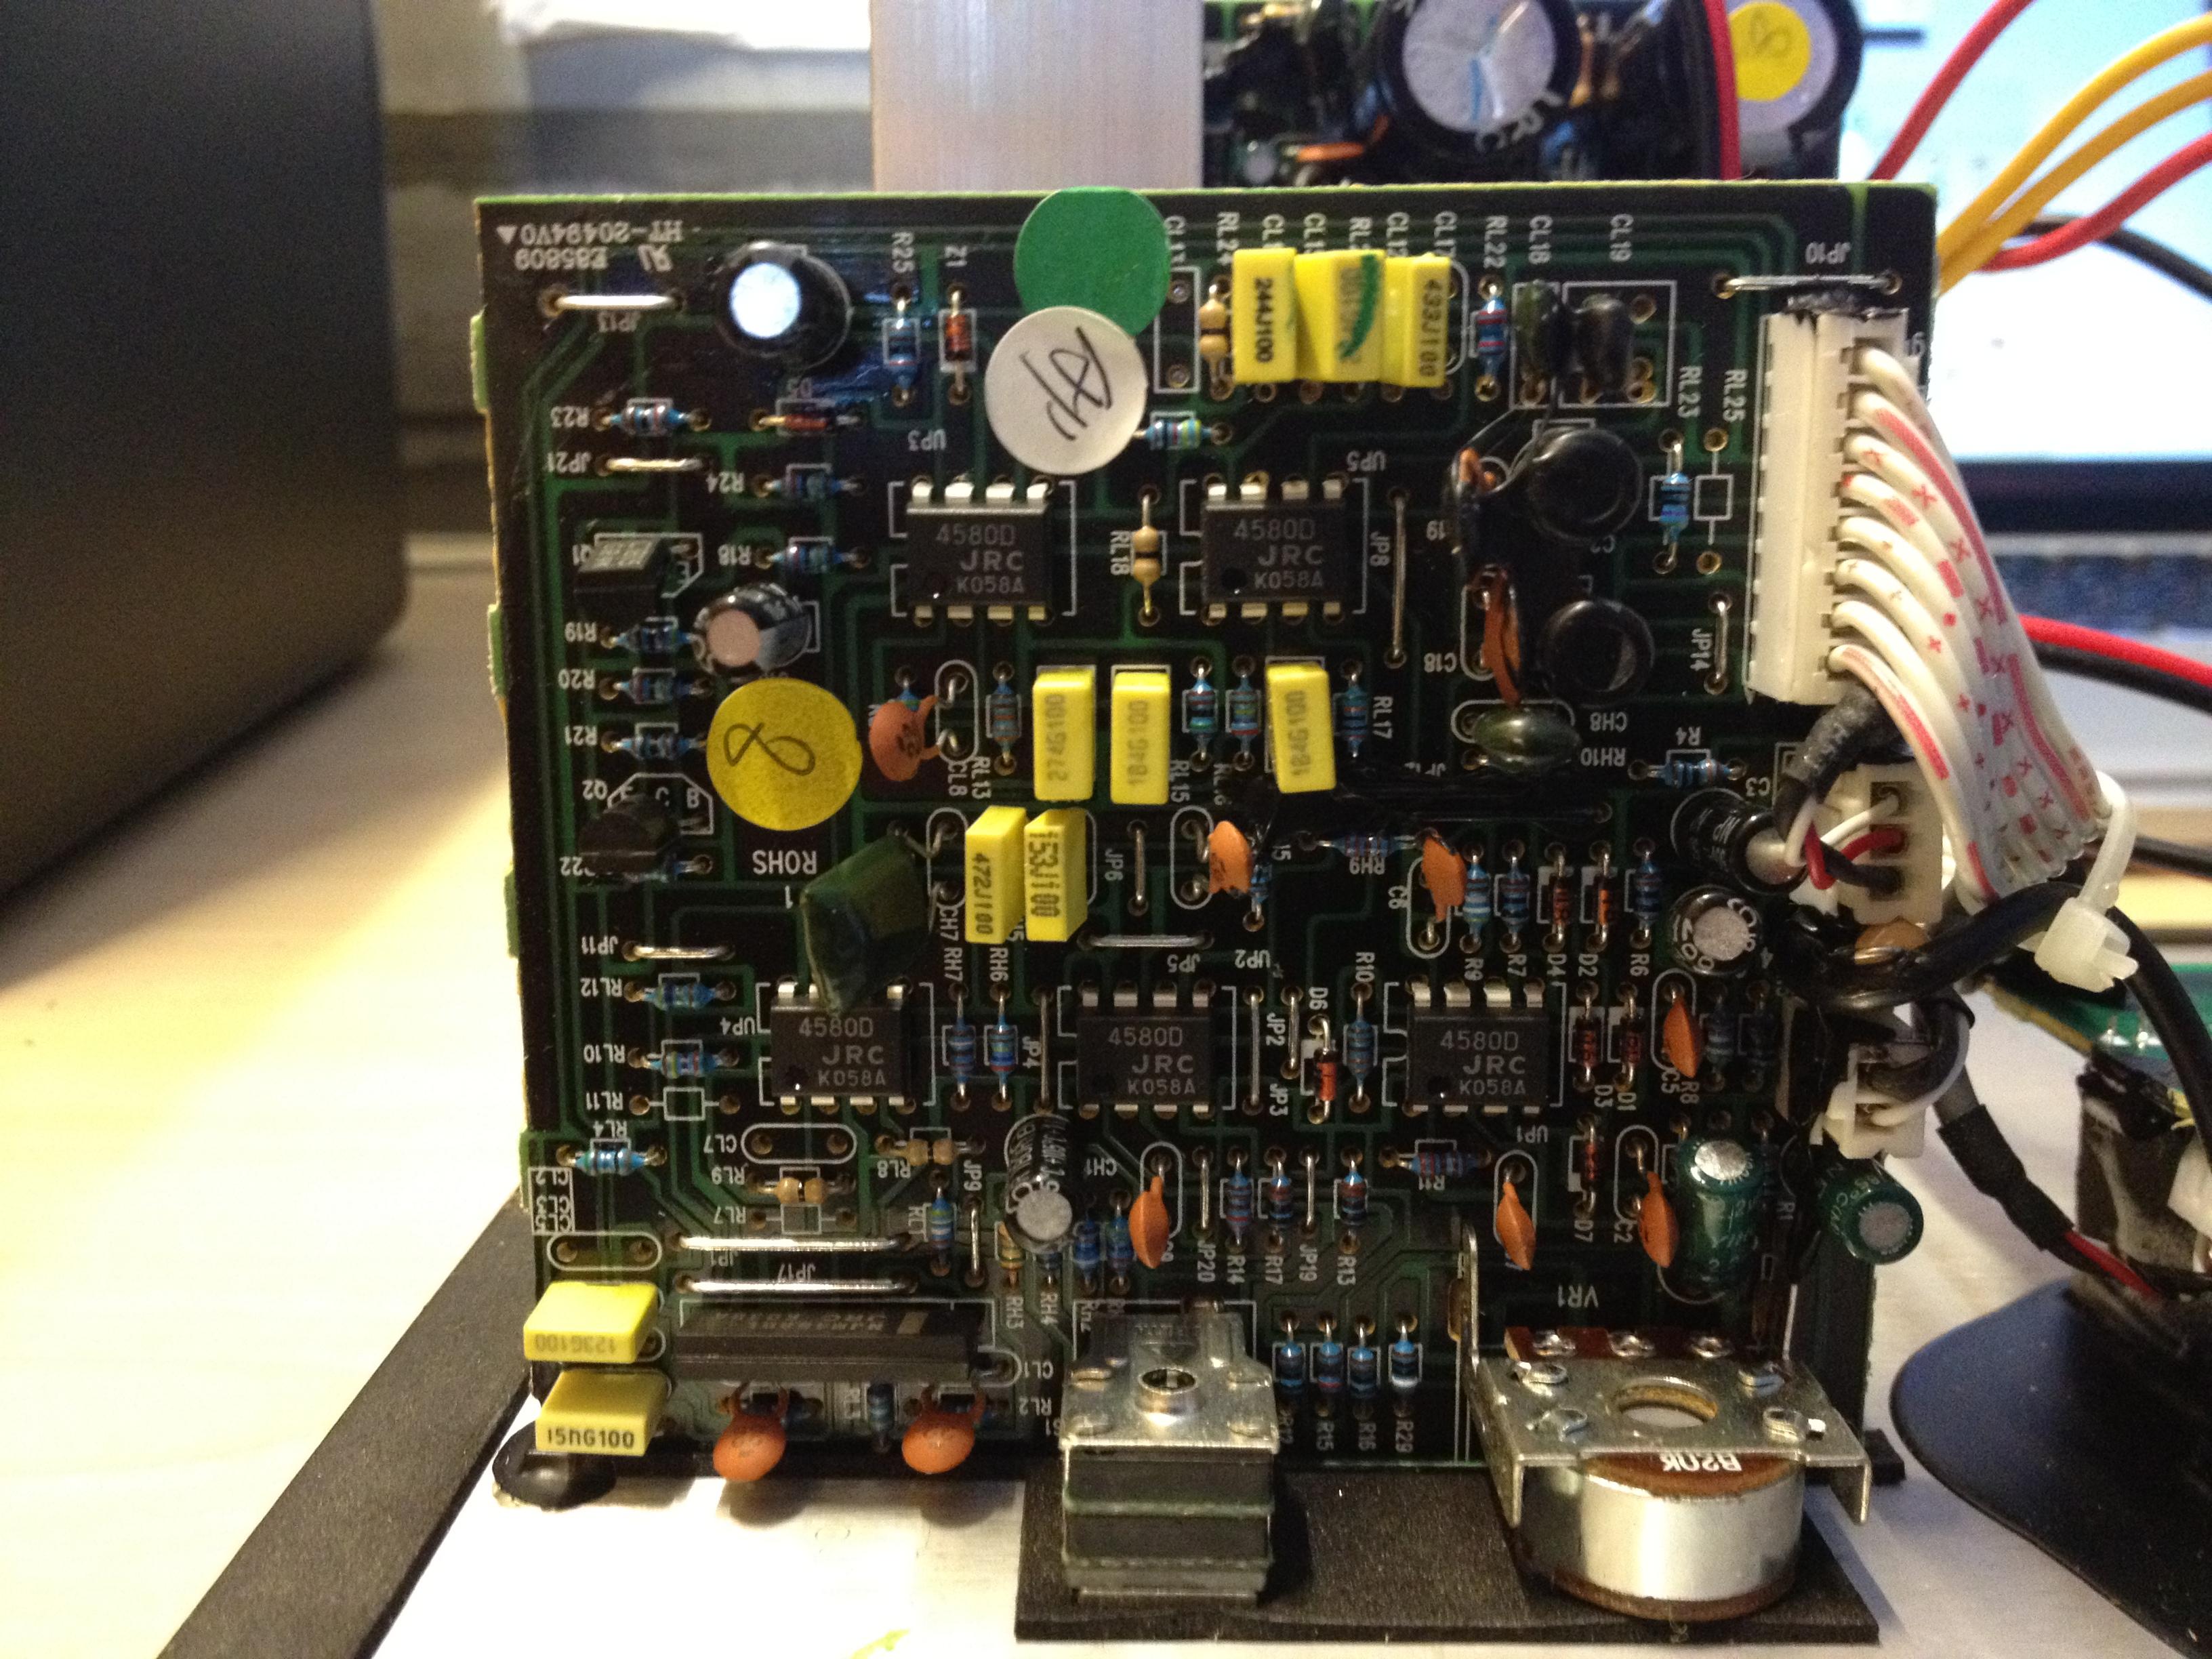 303009d1343669457-krk-rokit-rp8-g2-hf-amp-repair-img_0573.jpg